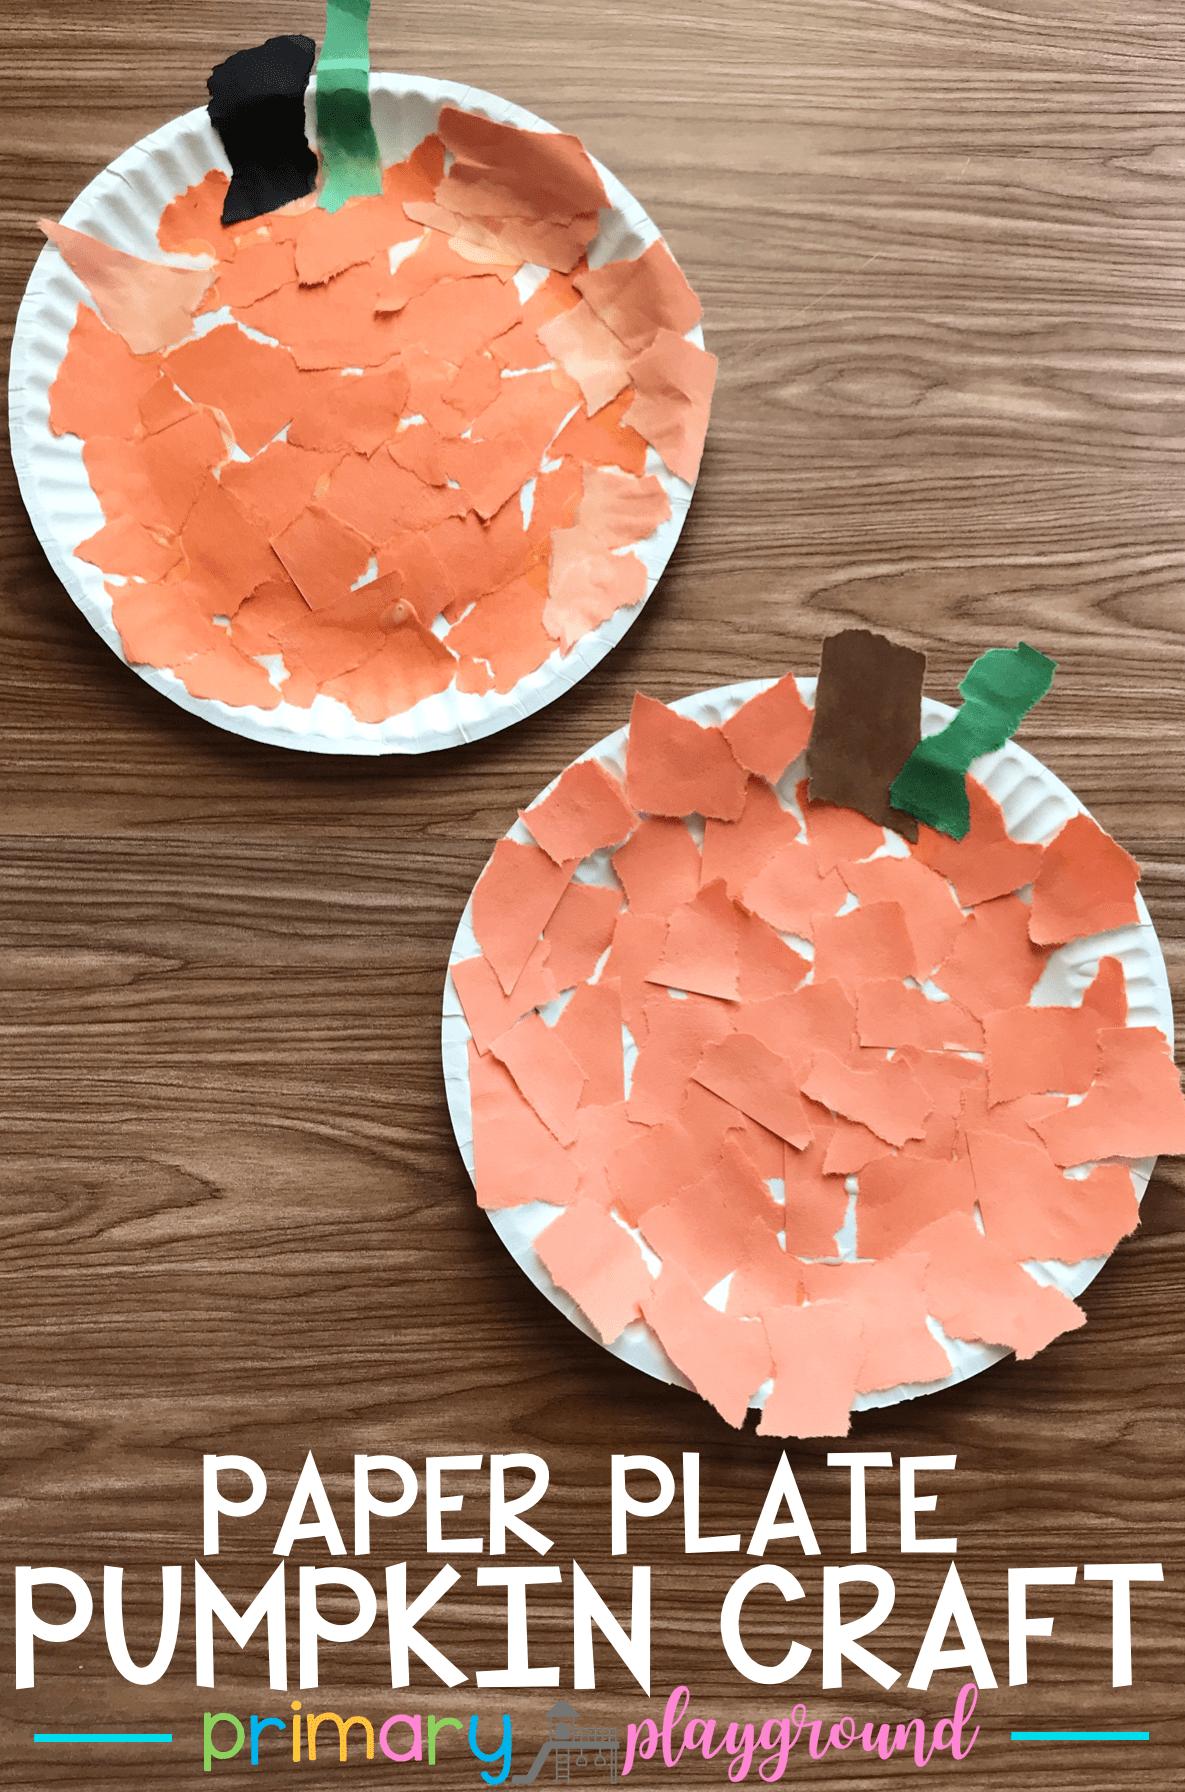 Paper Plate Pumpkin Craft - Primary Playground